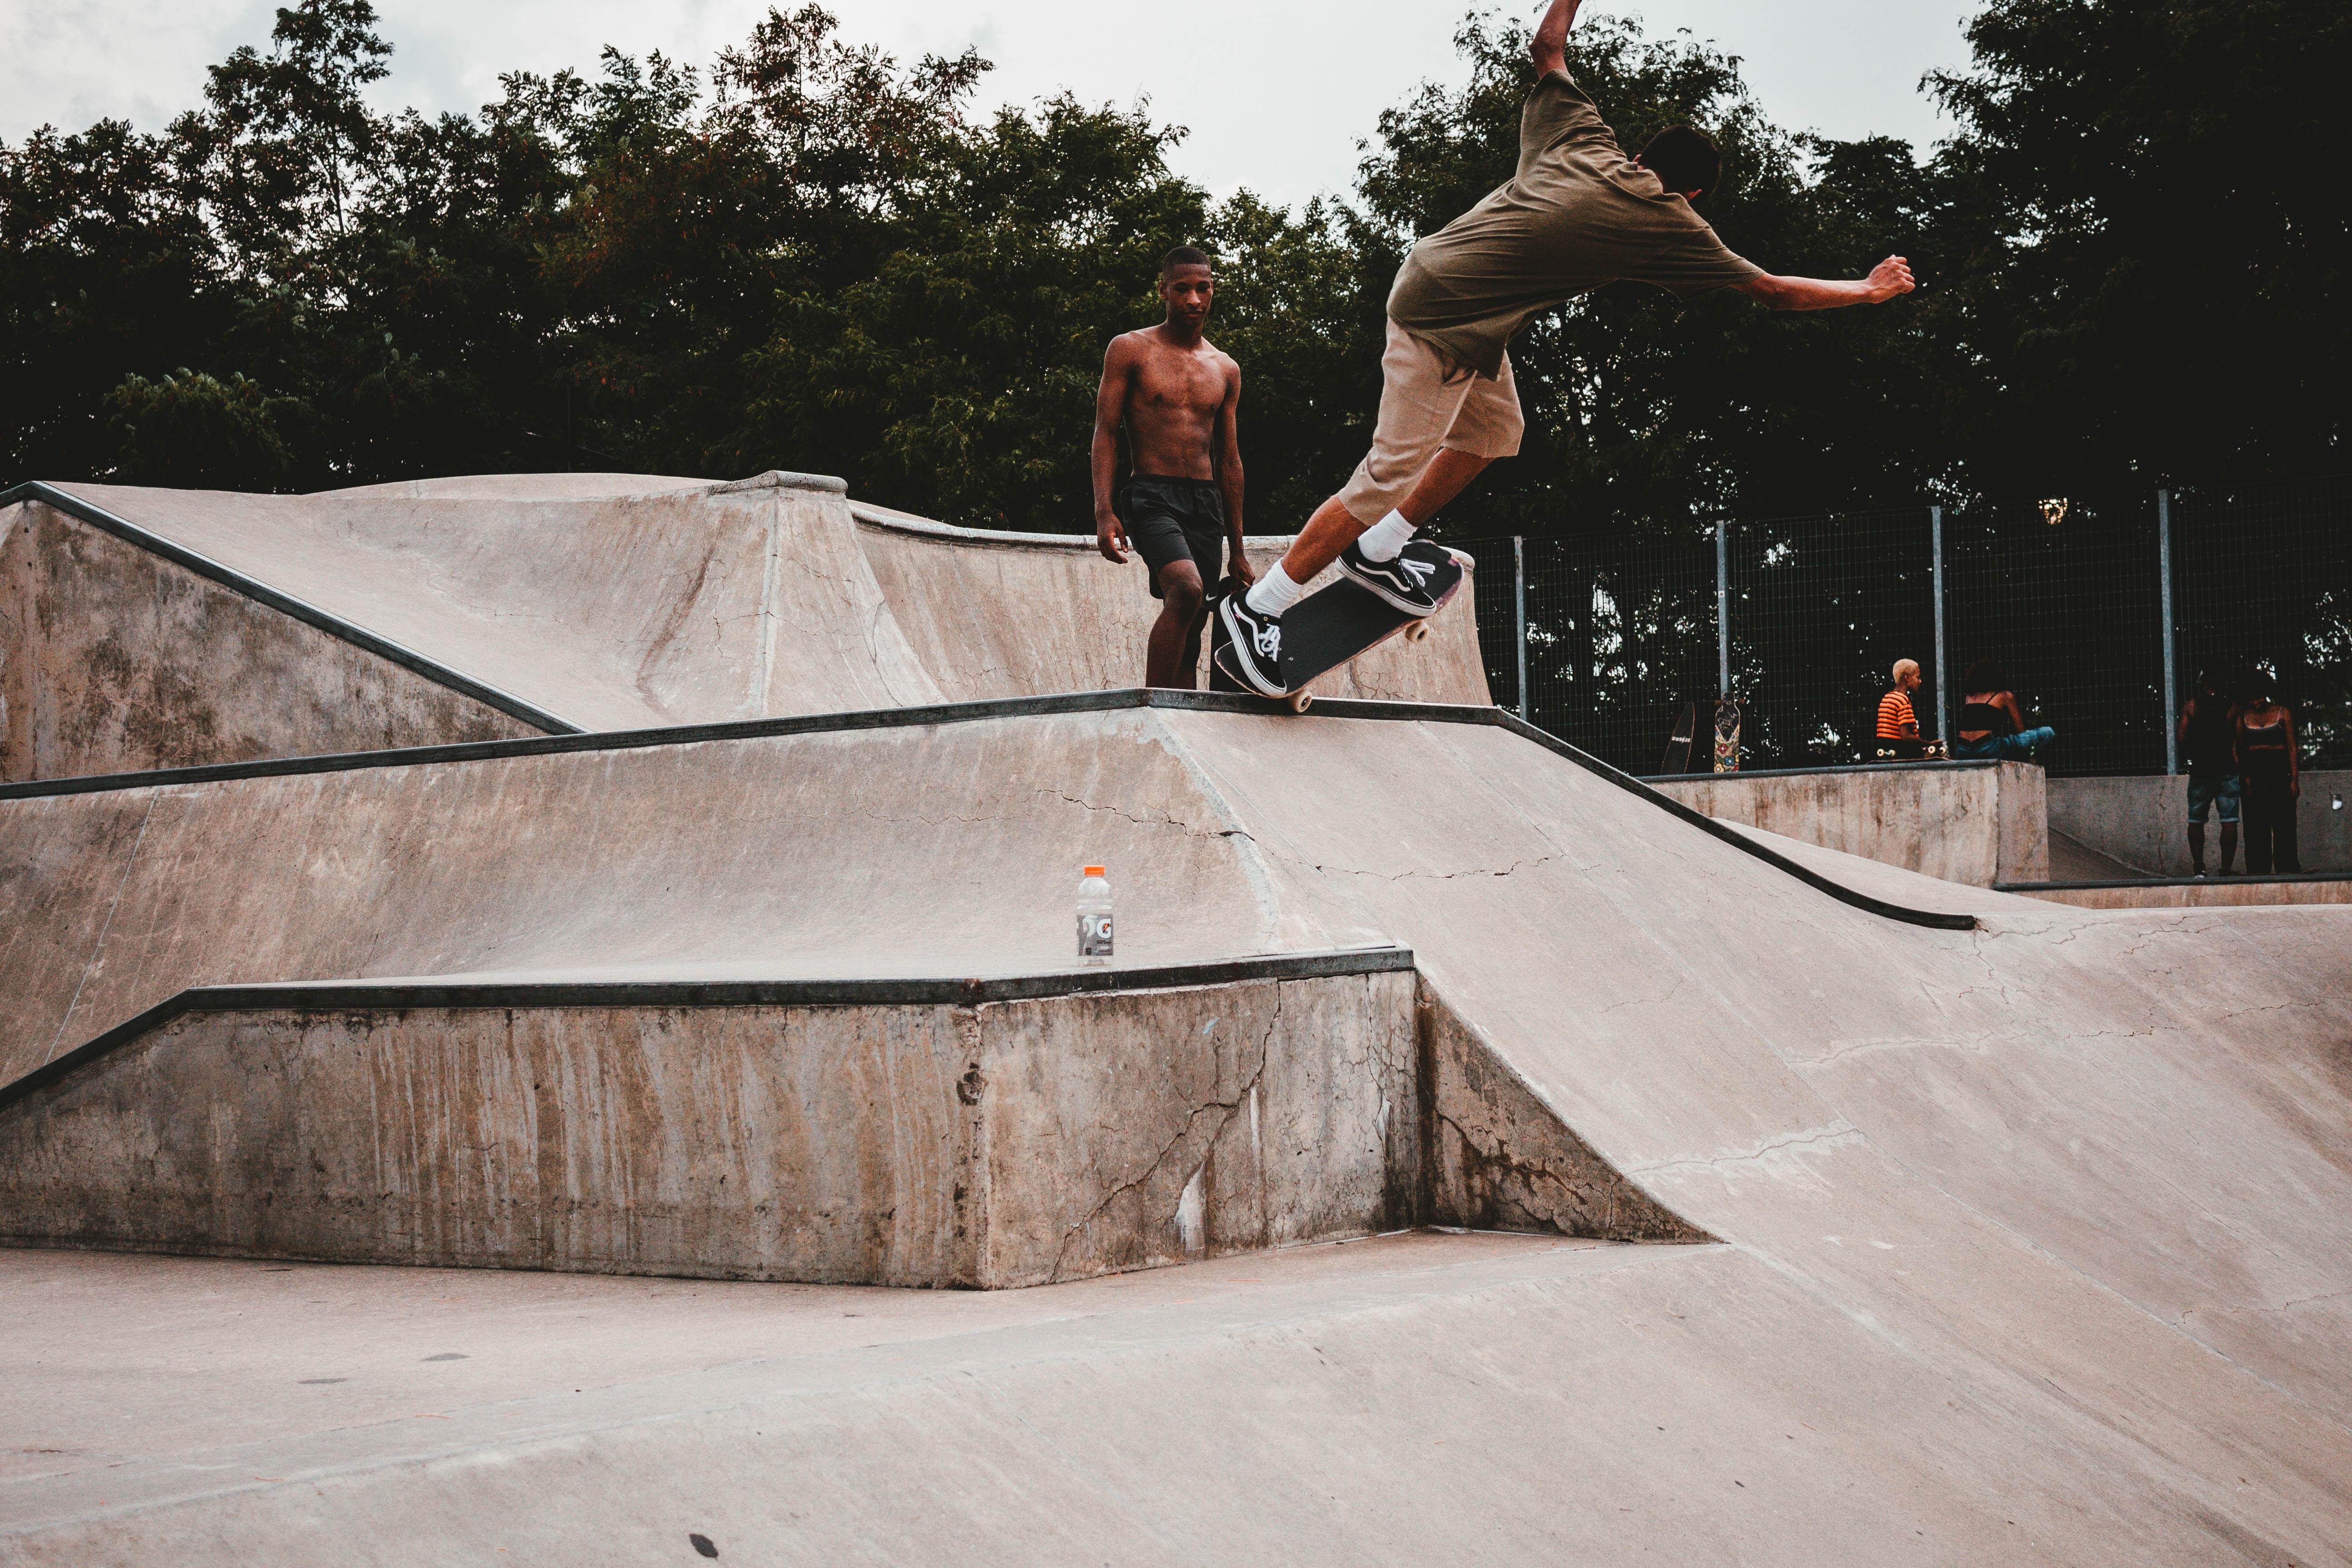 man grinding skateboard on ramp ledge near man